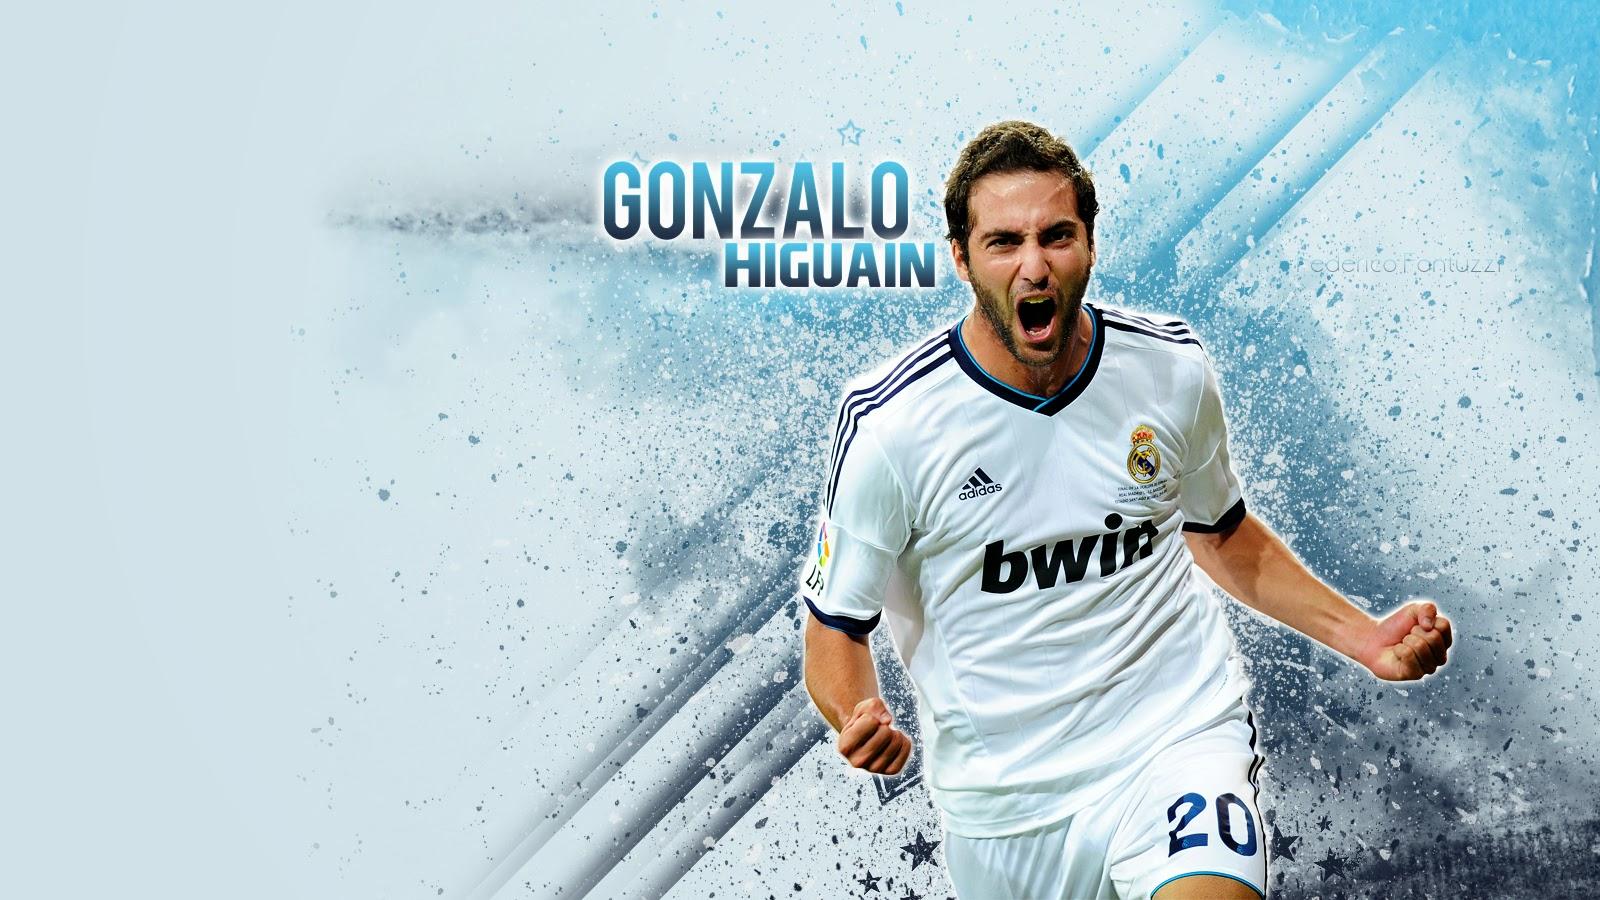 Football Wallpapers Hd New Gonzalo Higuaín Wallpaper Hd Real Madrid